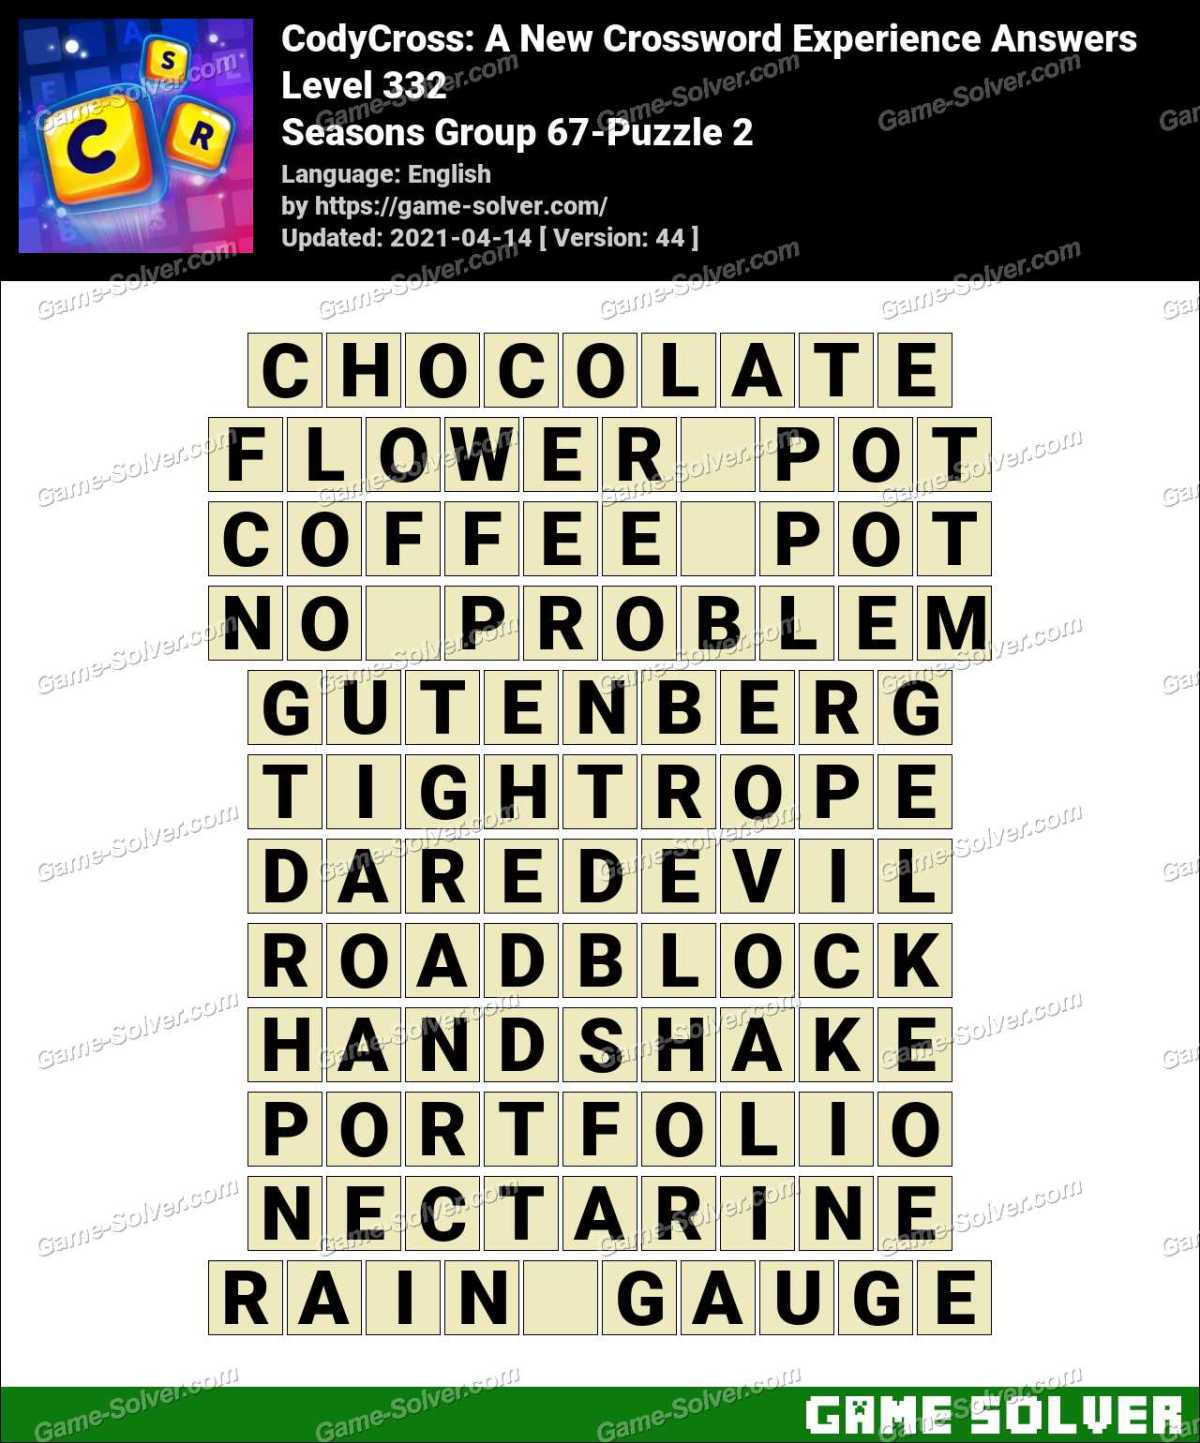 CodyCross Seasons Group 67-Puzzle 2 Answers